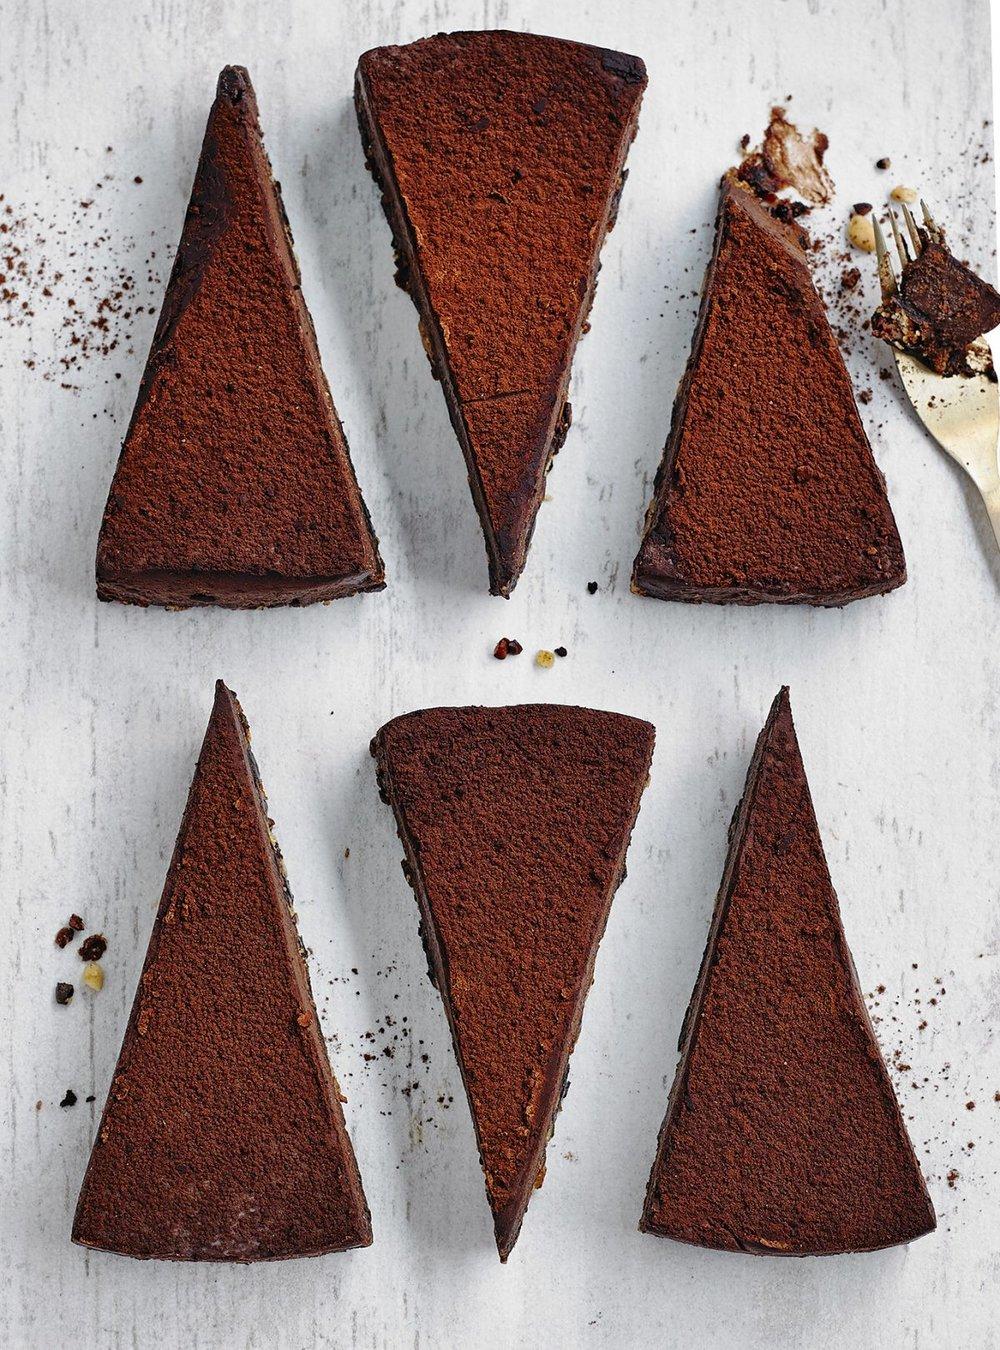 VEGAN CHOCOLATE TORTE, WAITROSE